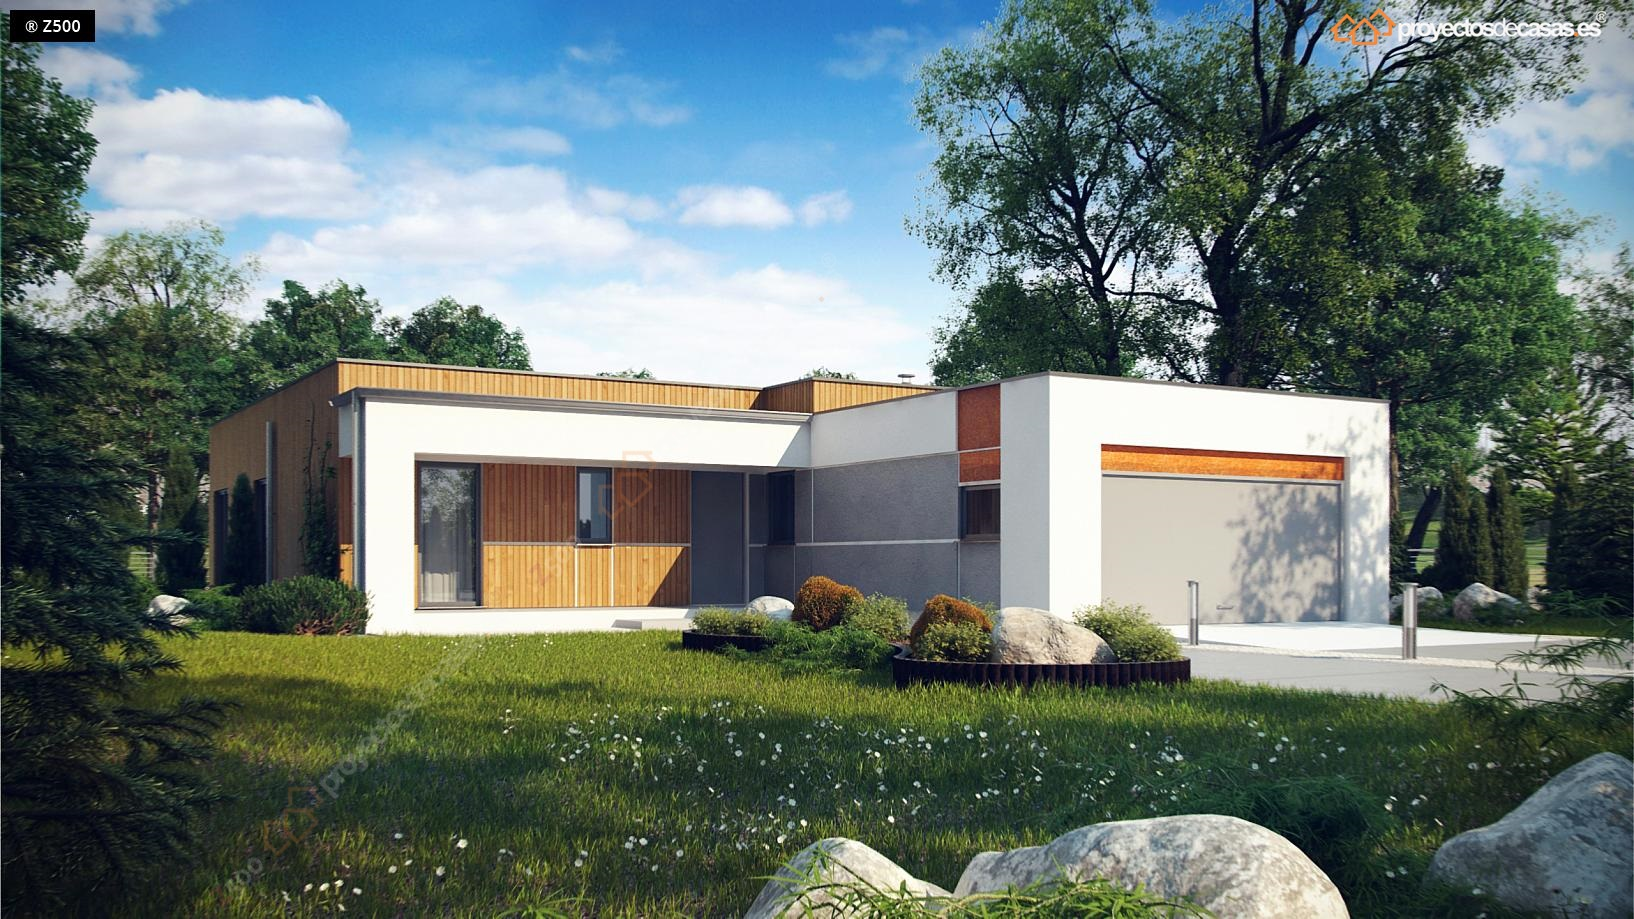 Proyectos de casas casa moderna de 1 planta con piscina for Distribucion de casas modernas de una planta